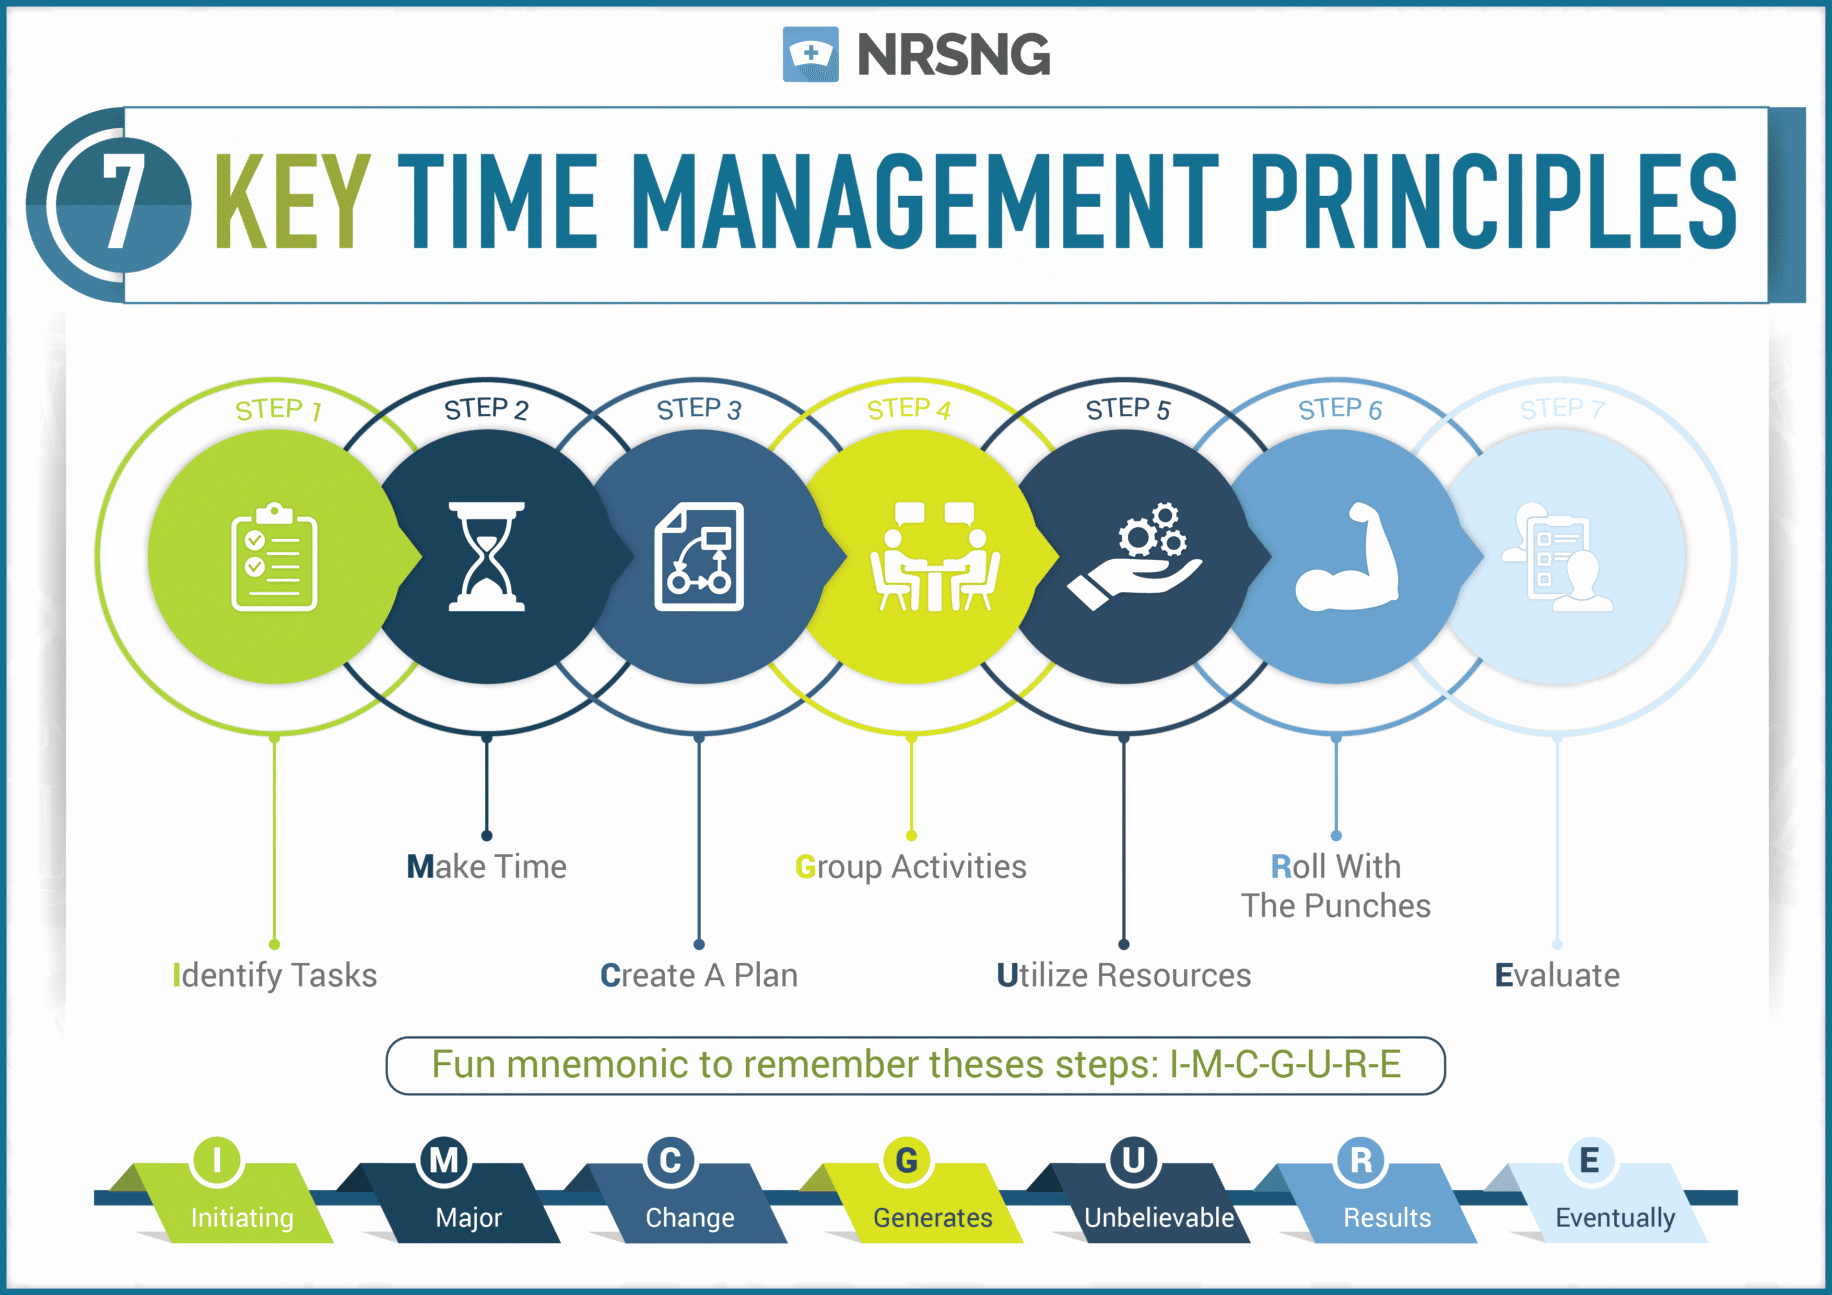 Nursing Time Management Sheet Awesome Infographic 7 Key Time Management Principles